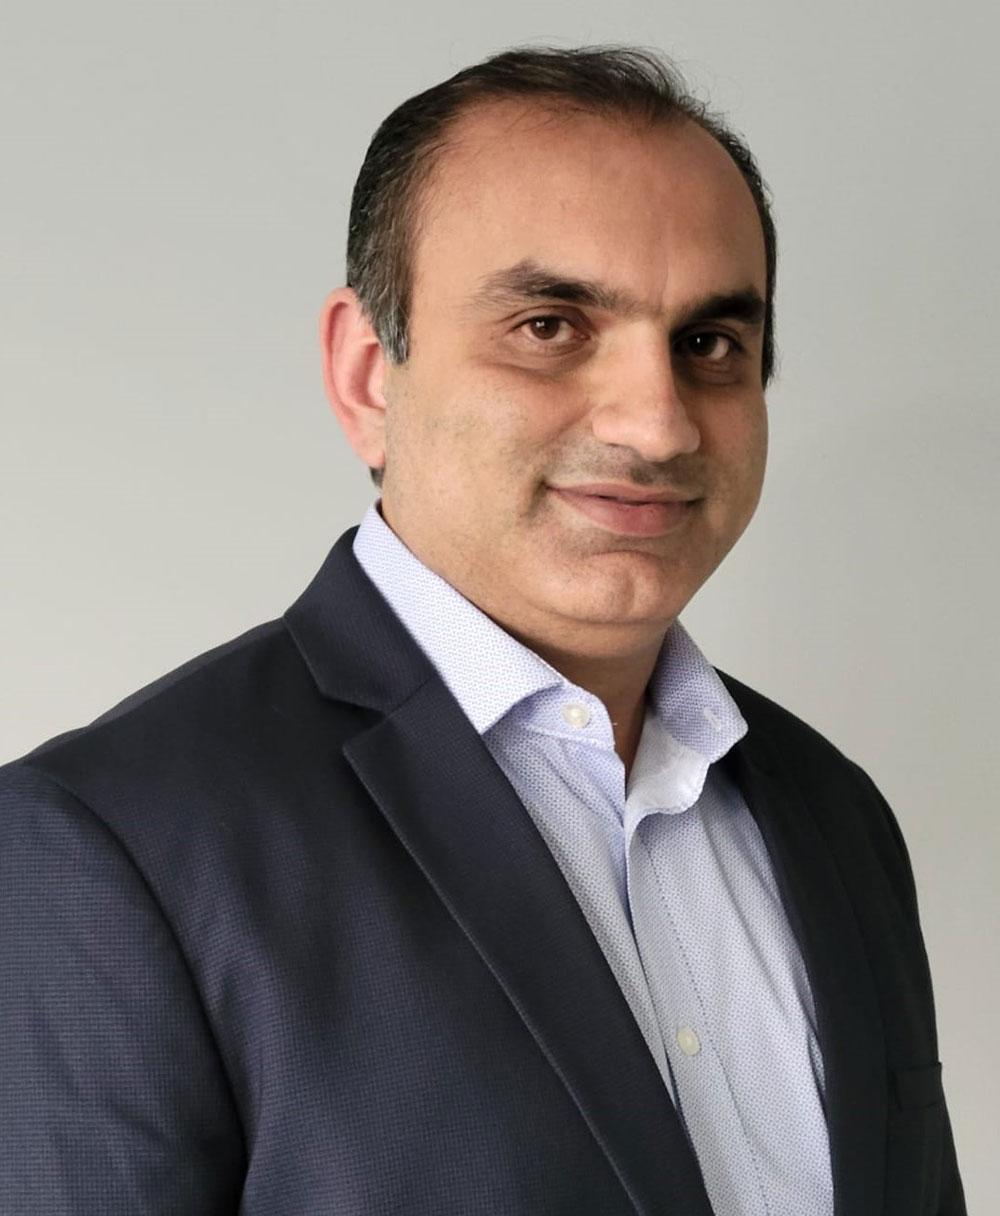 https://www.moorelendinggroup.com/wp-content/uploads/2021/05/Muhammad-Patel.jpg